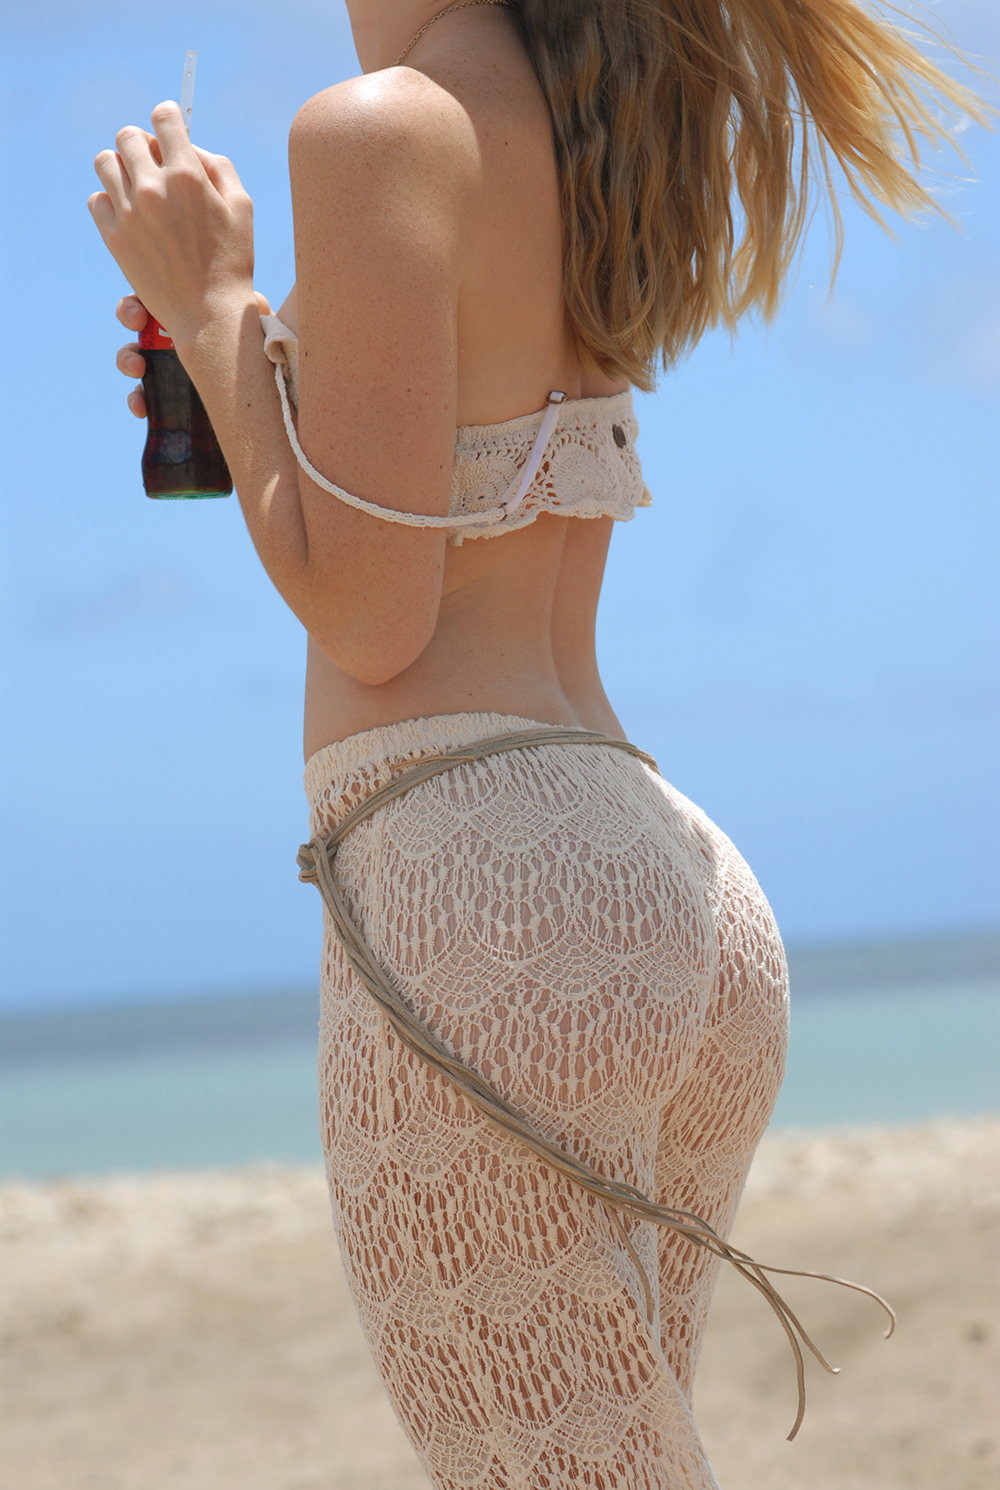 Swimbook_swimsuit_Eberjey_McKenzie_Hatcher_DSC_0930.jpg